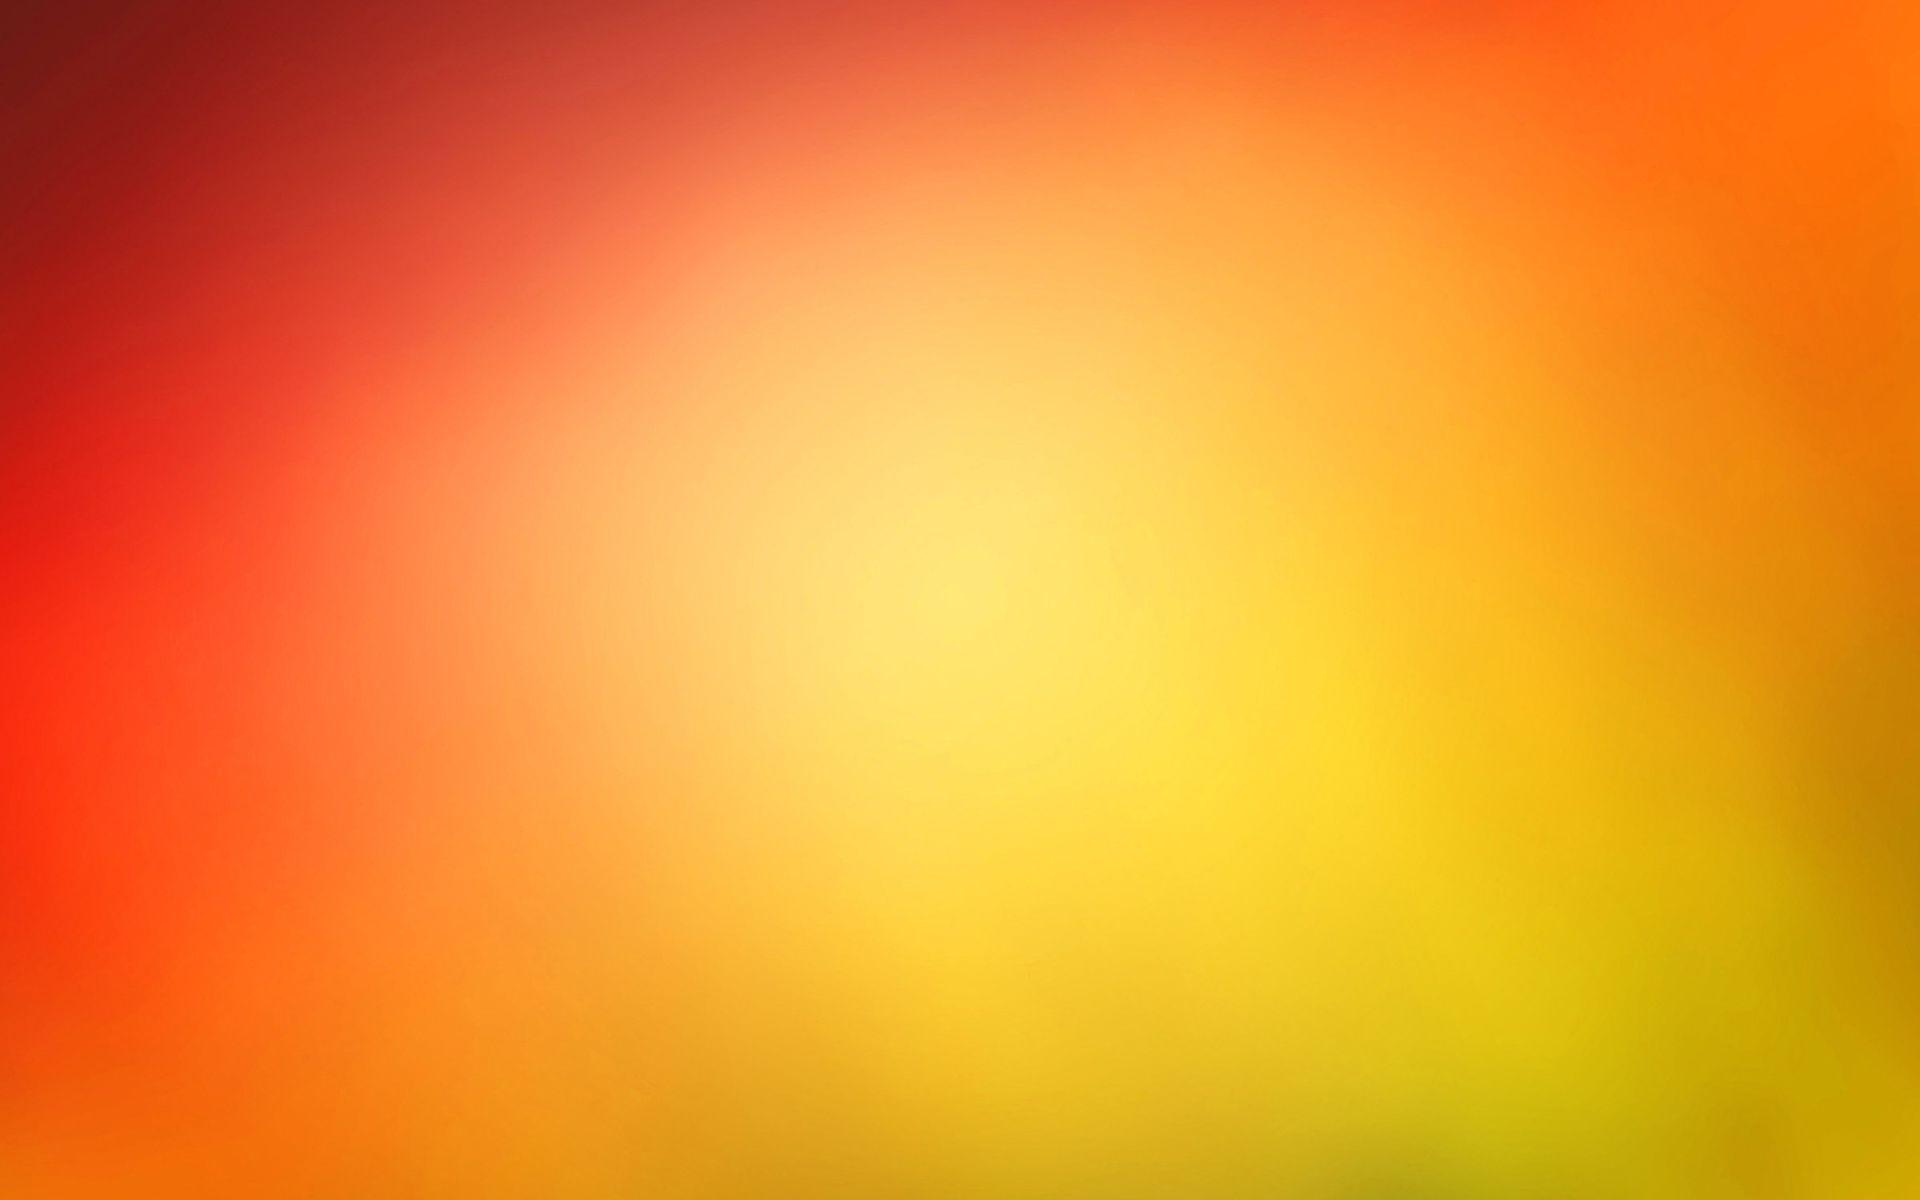 Resultado de imagen para background heart | Yellow - naranja ... for Light Orange Background Wallpaper  70ref